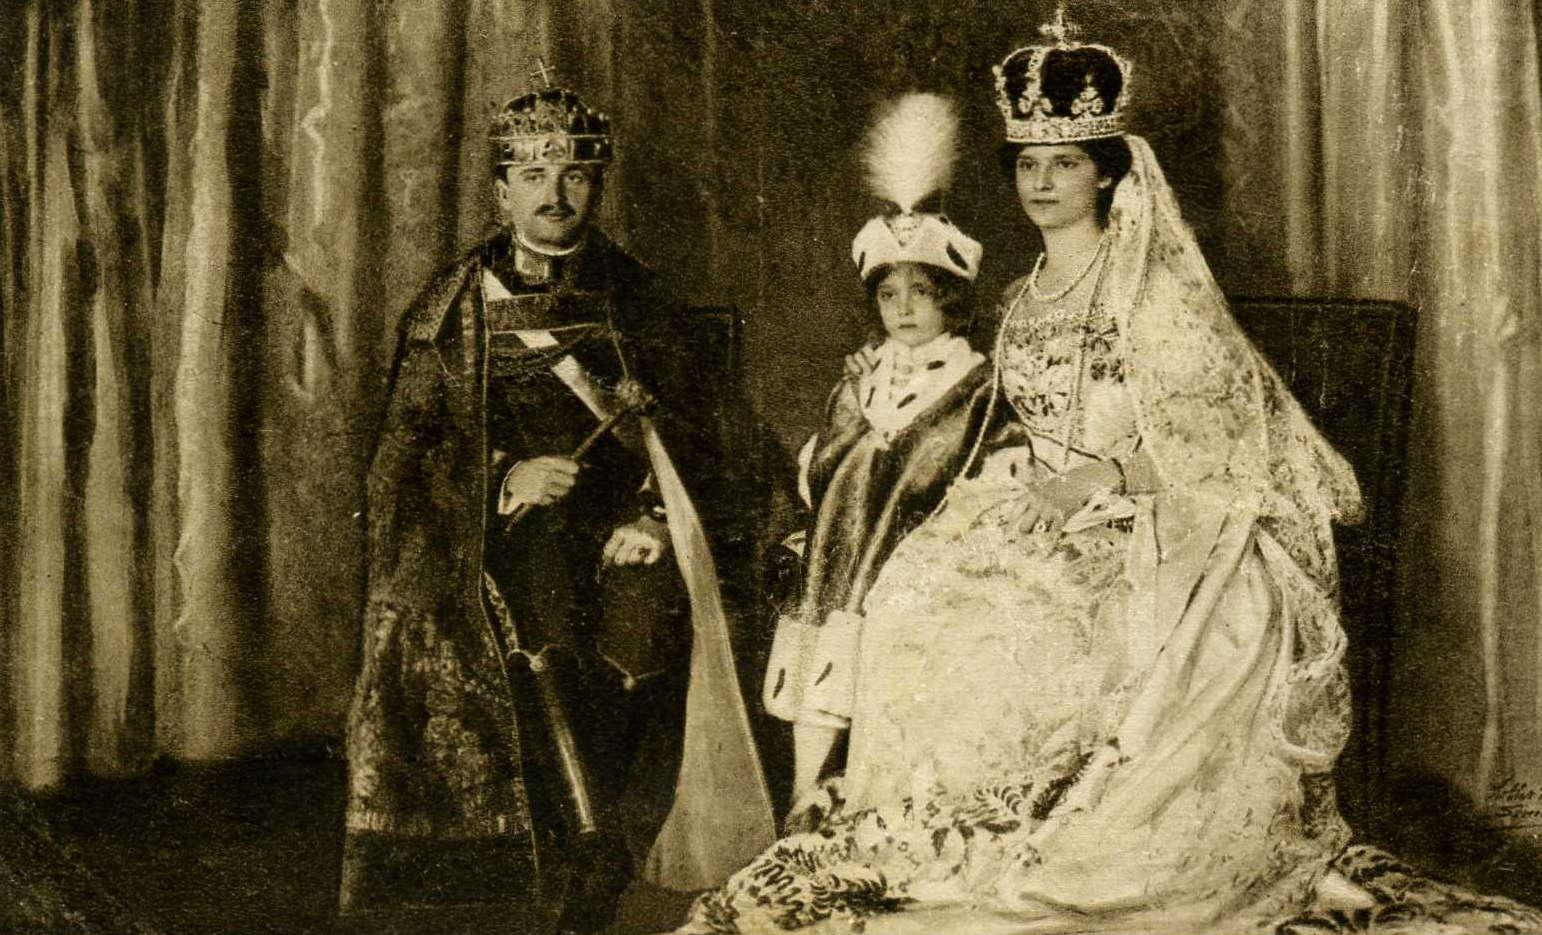 famiglia reale austria.jpg